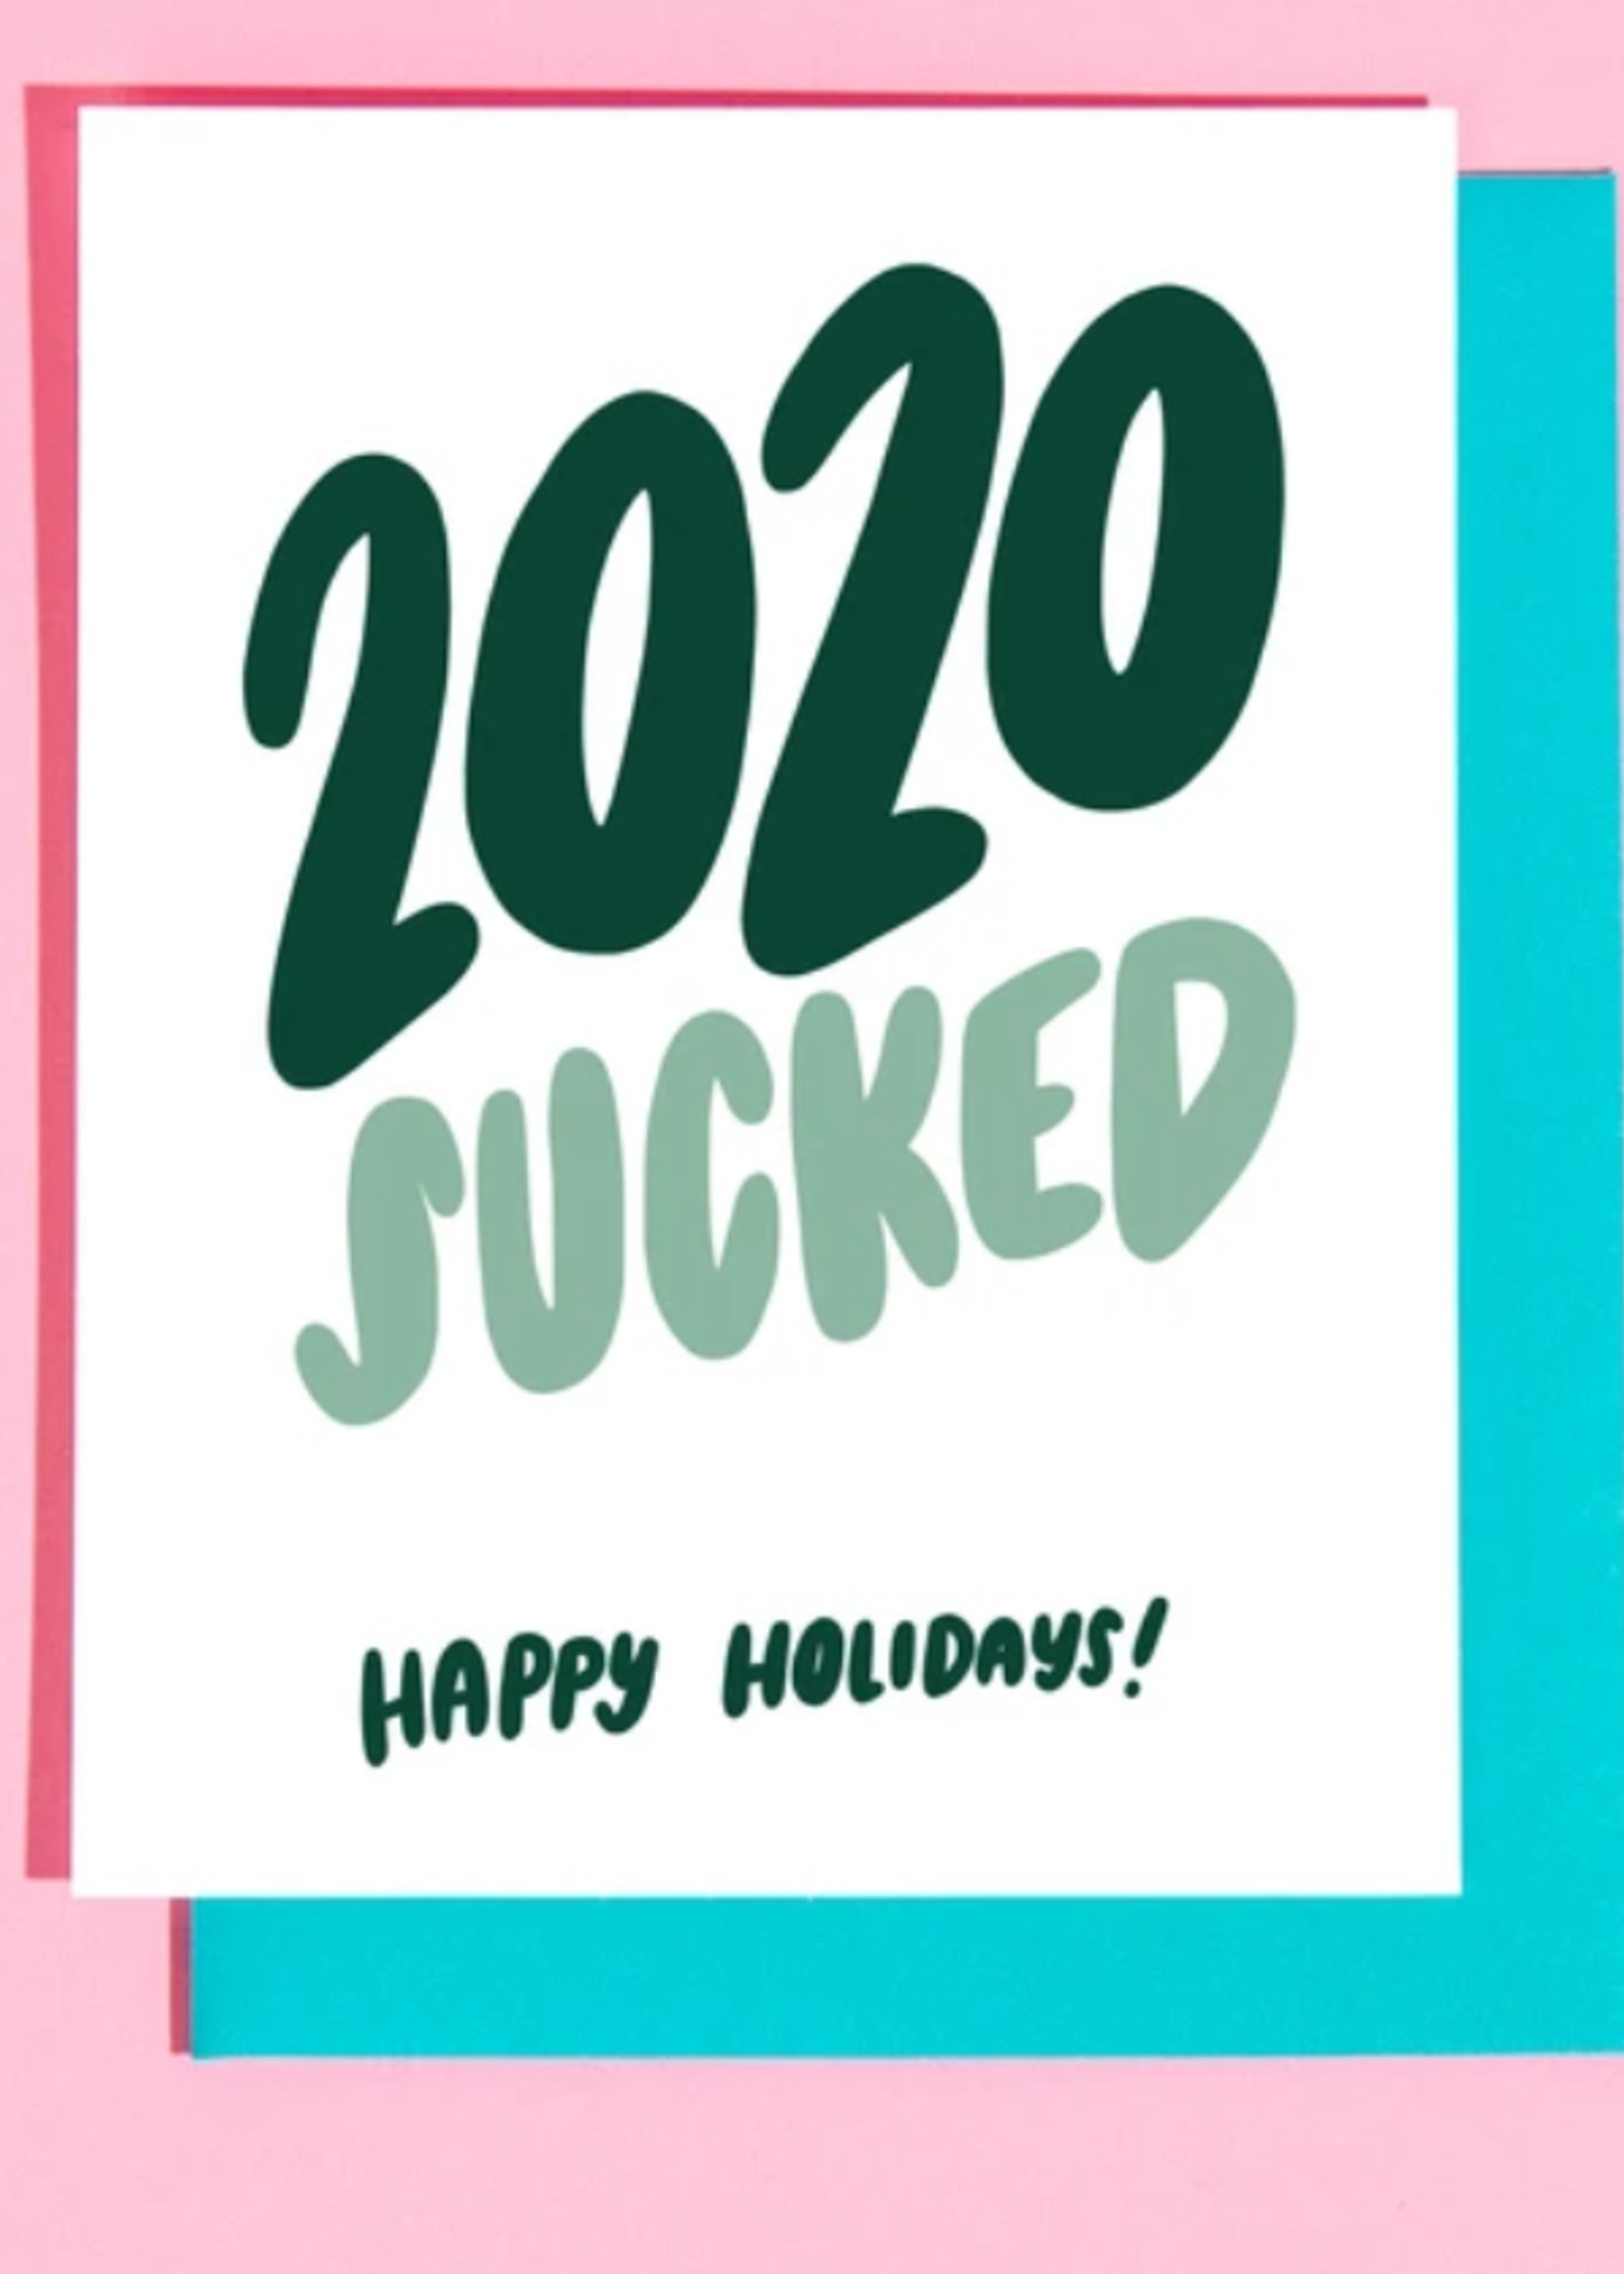 craft boner 2020 sucked card